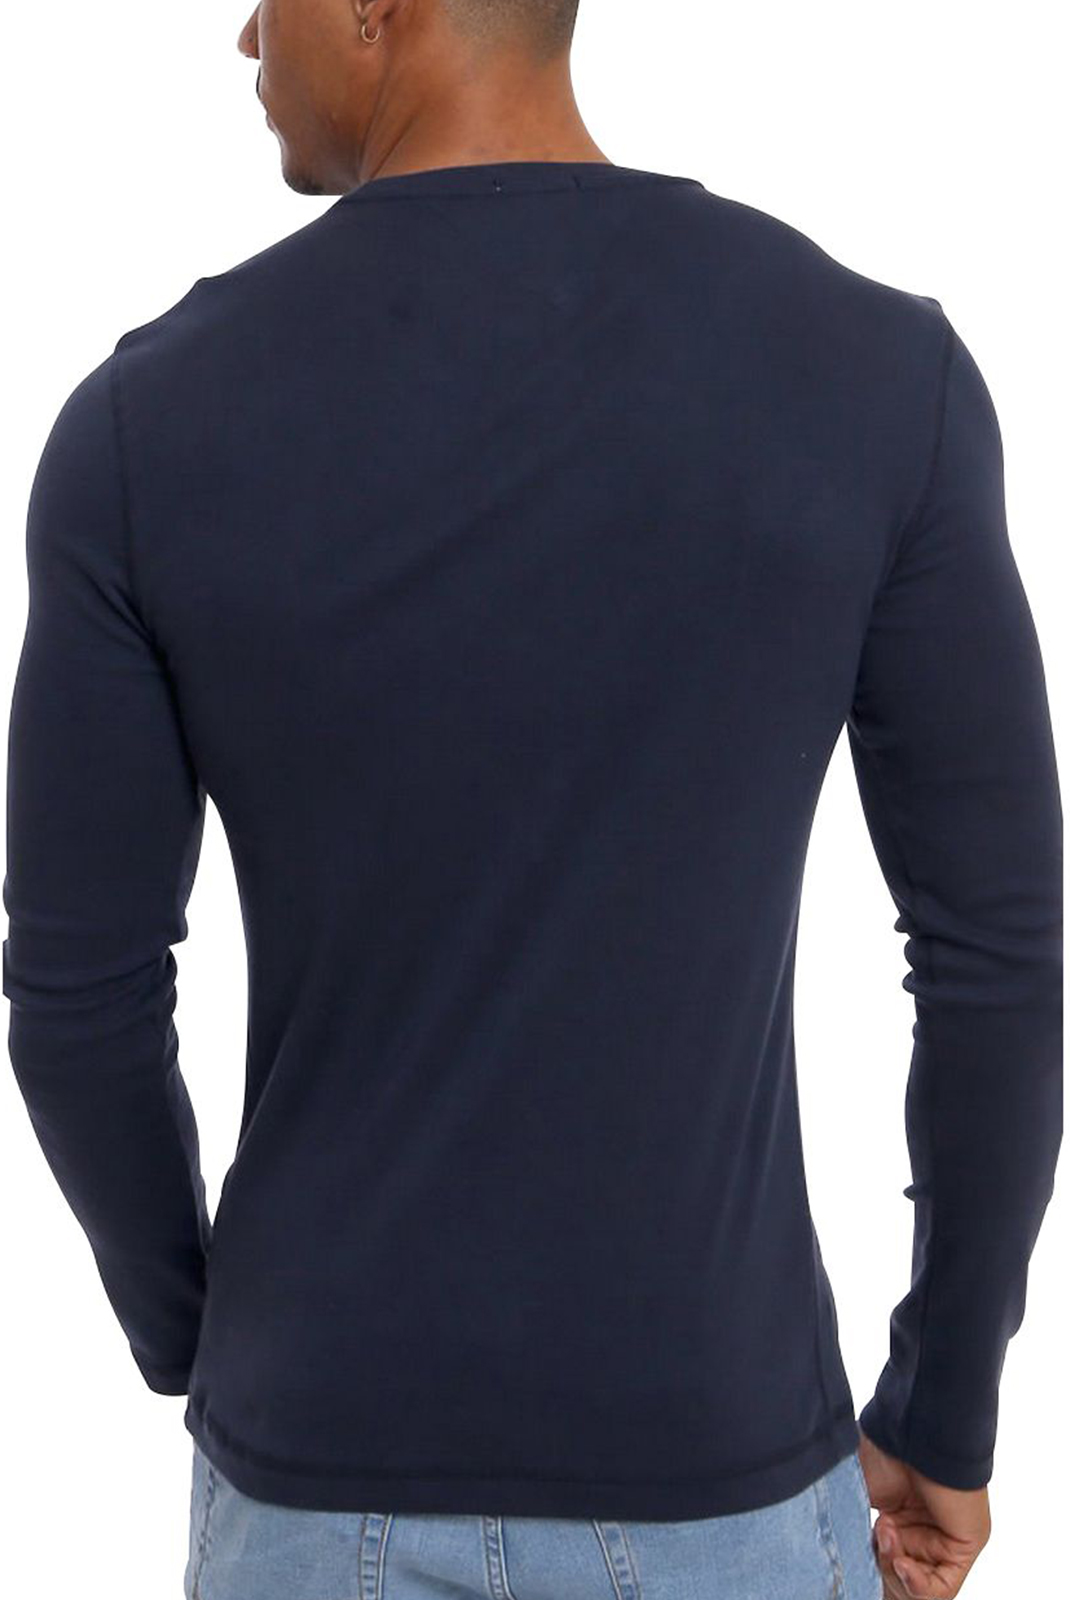 Tee-shirts  Tommy hilfiger DM0DM04409 RIB LONGSLEEVE 002 BLACK IRIS